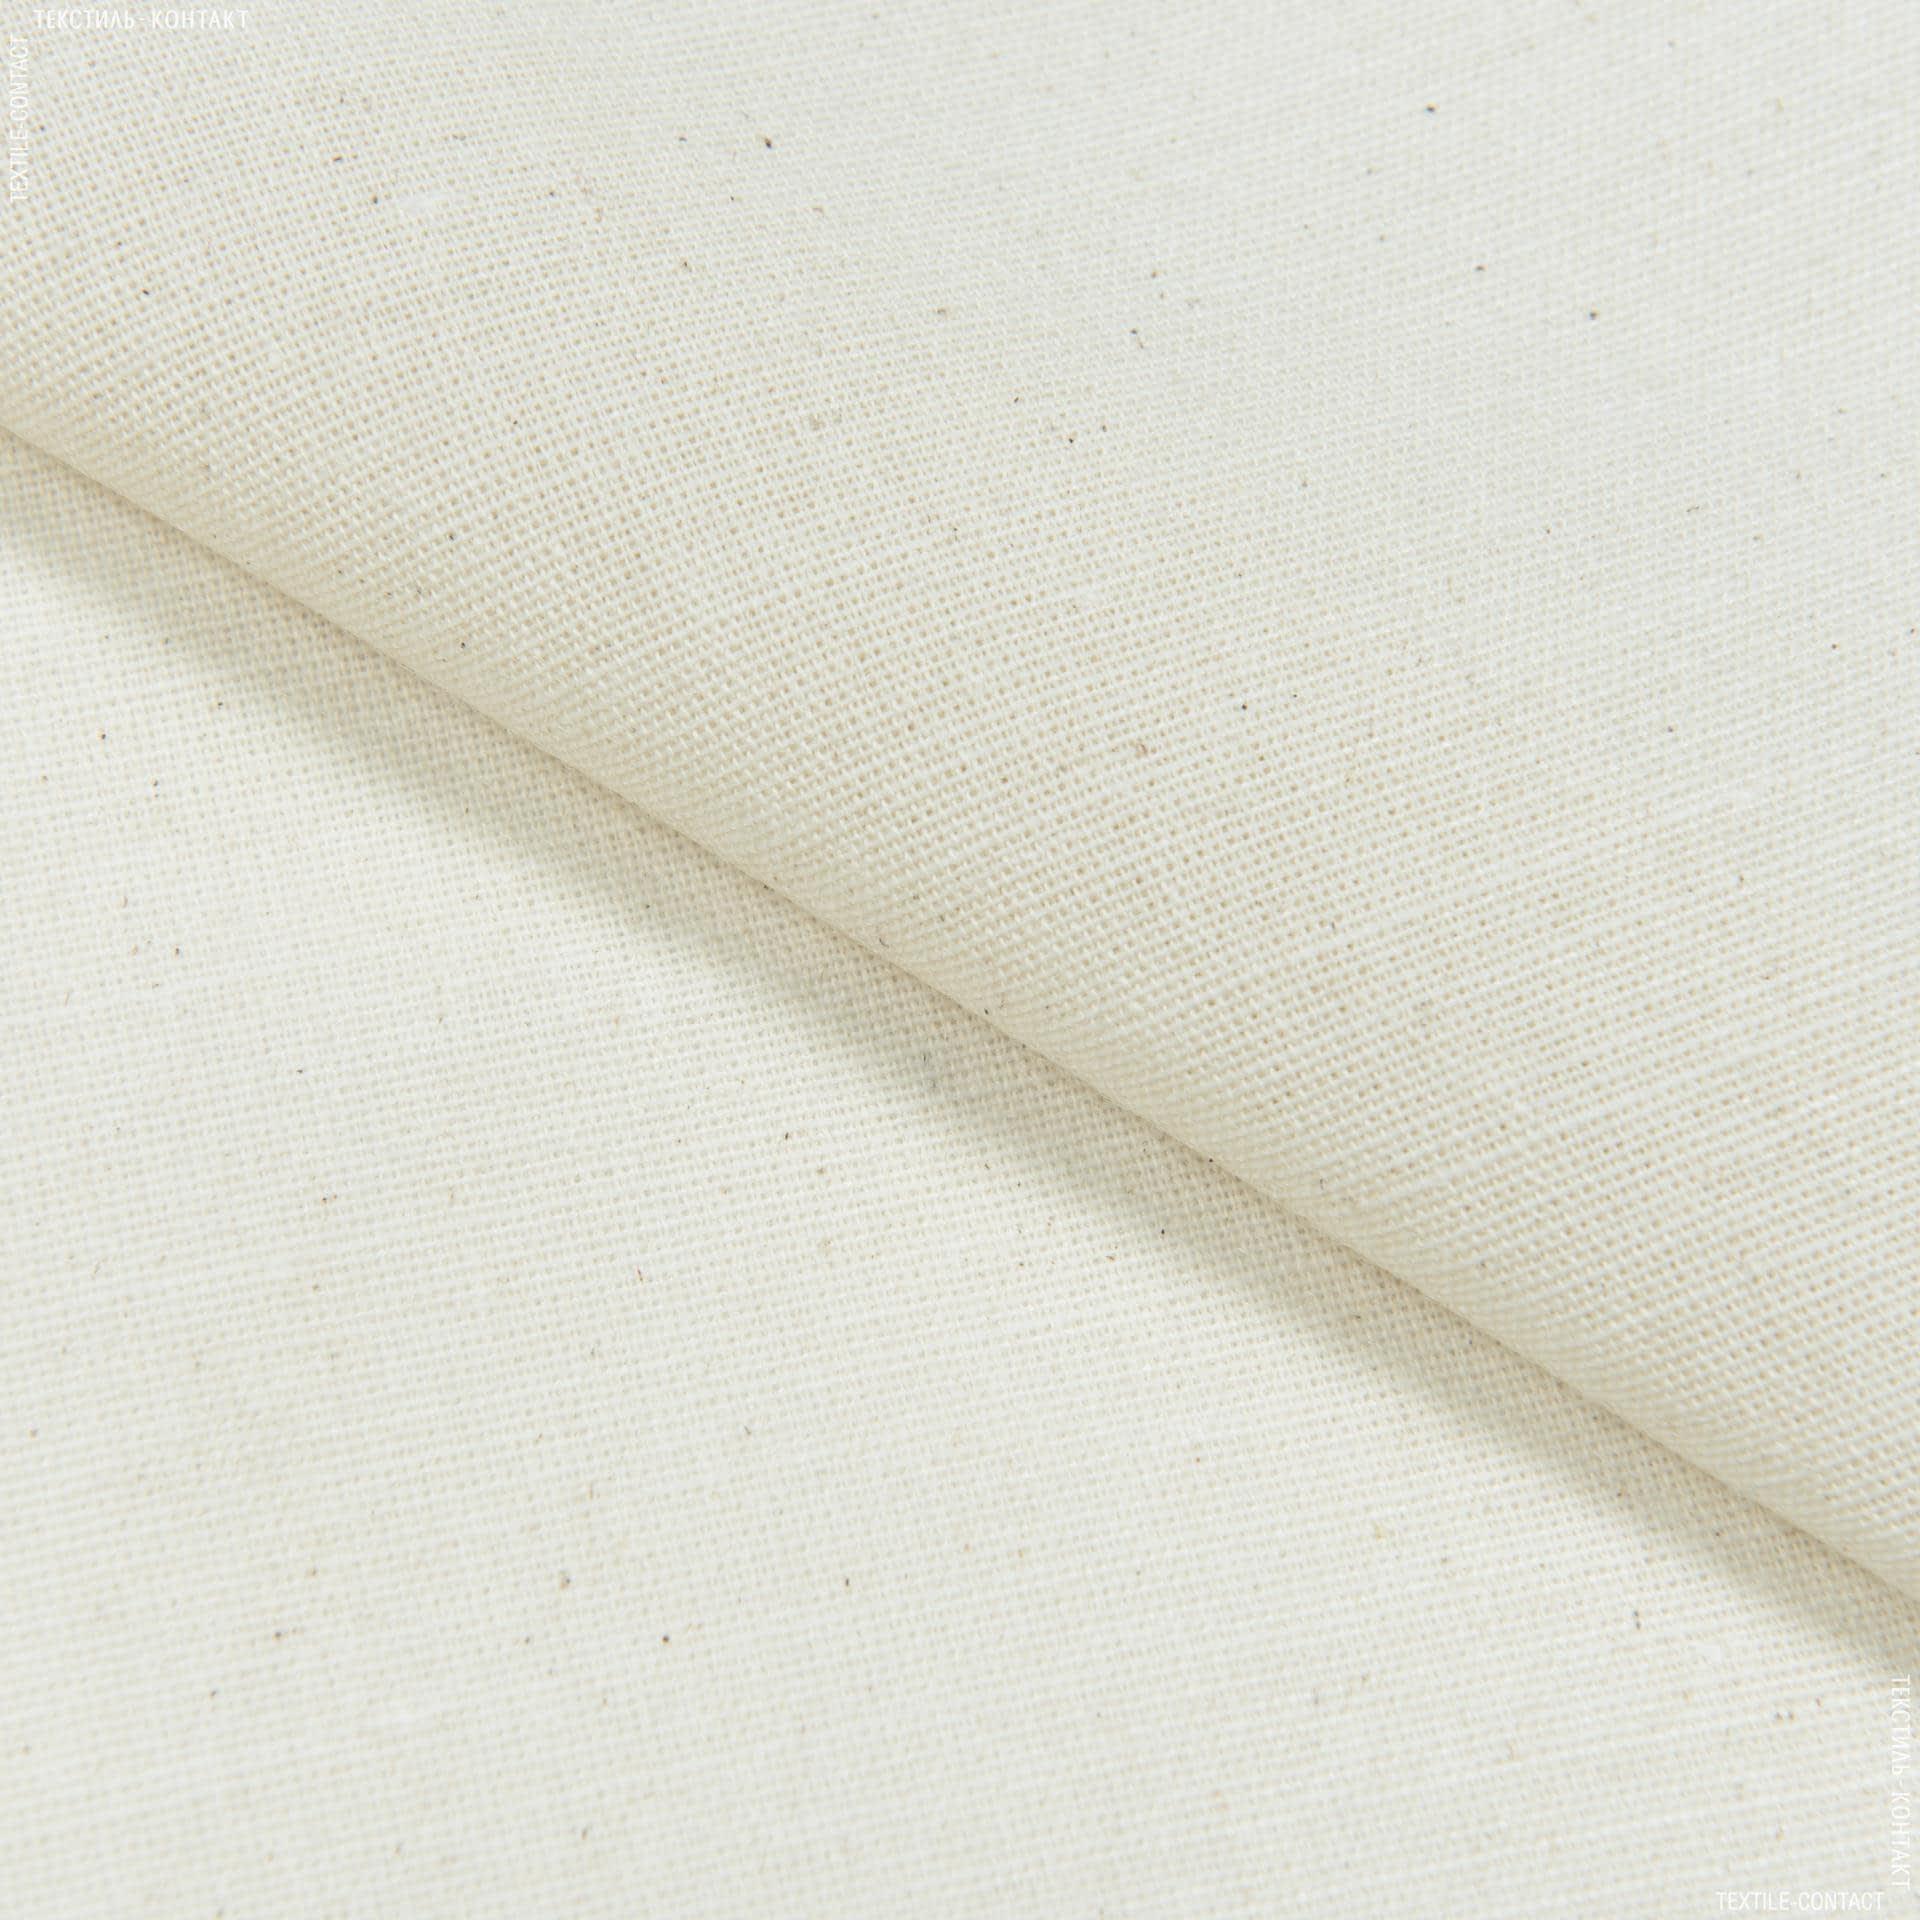 Ткани дублирин, флизелин - Бортовка клеевая